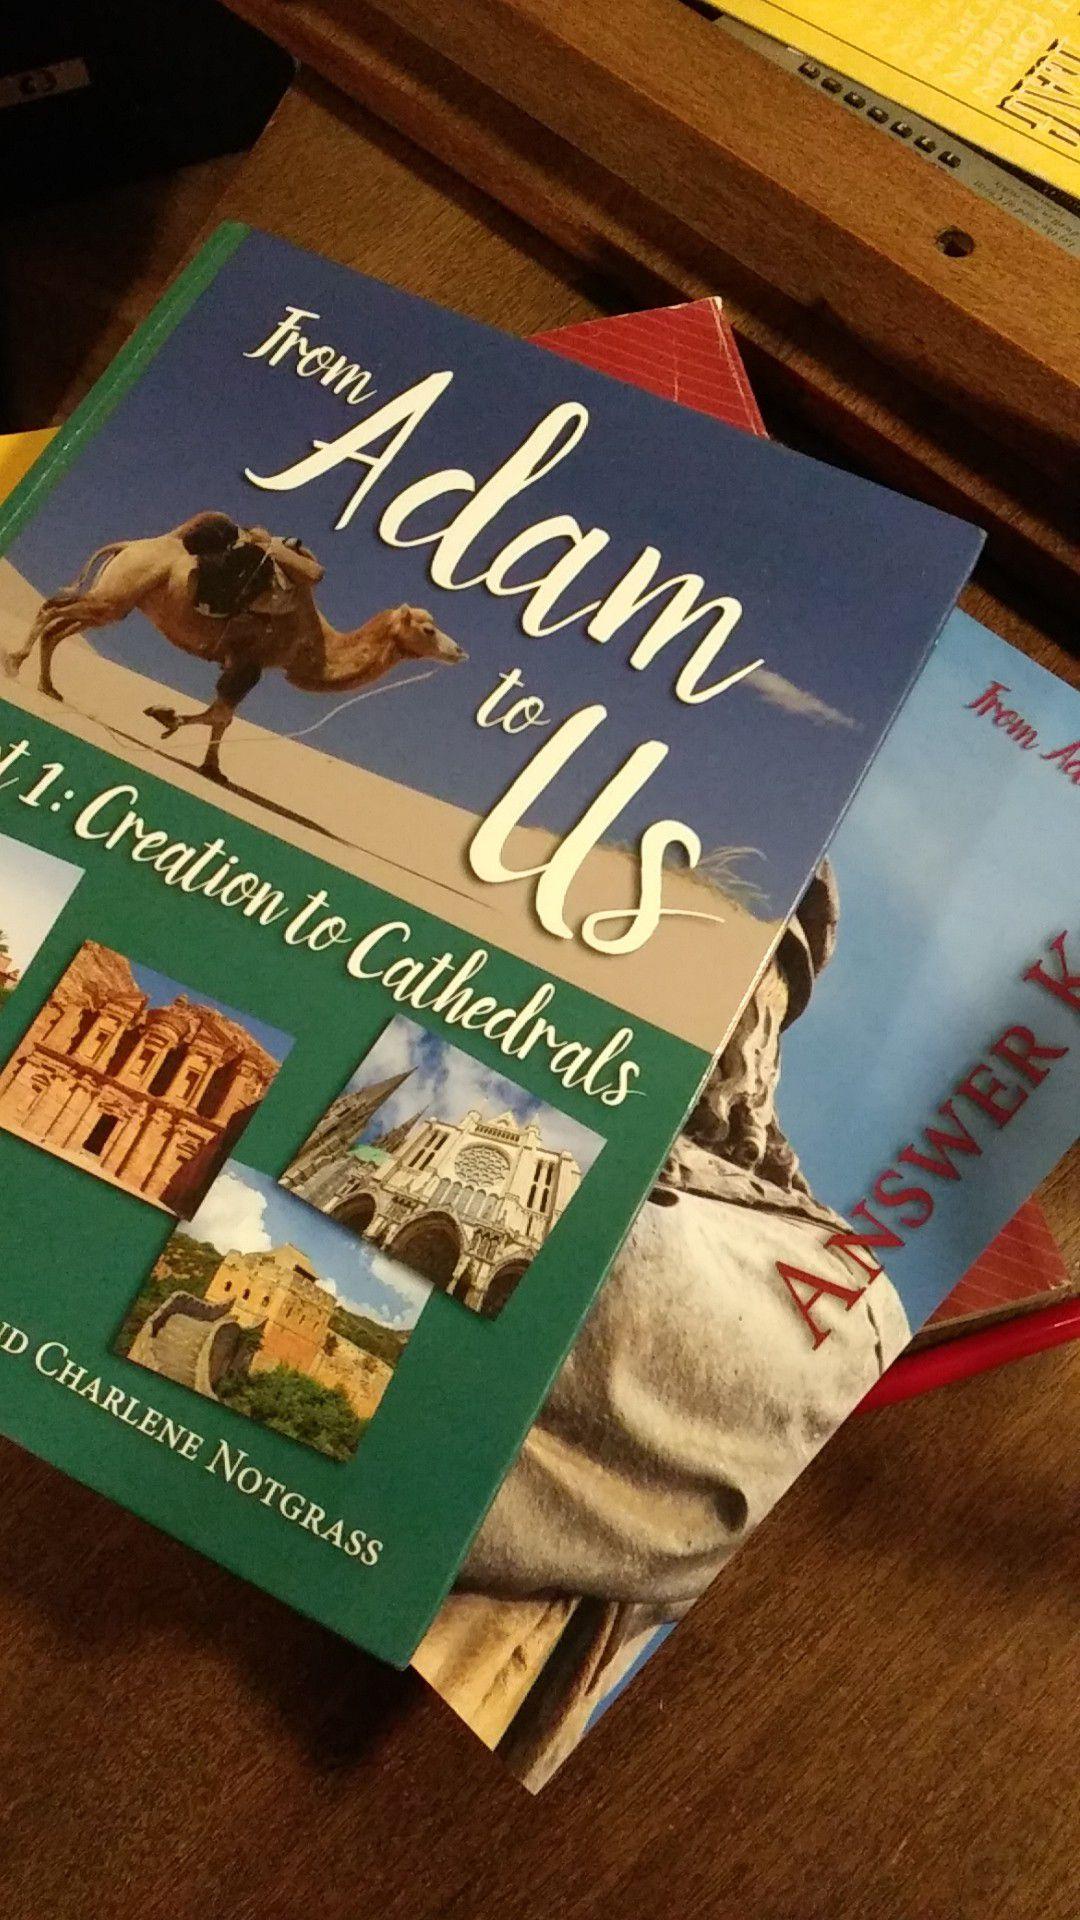 Home School Notgrass History books